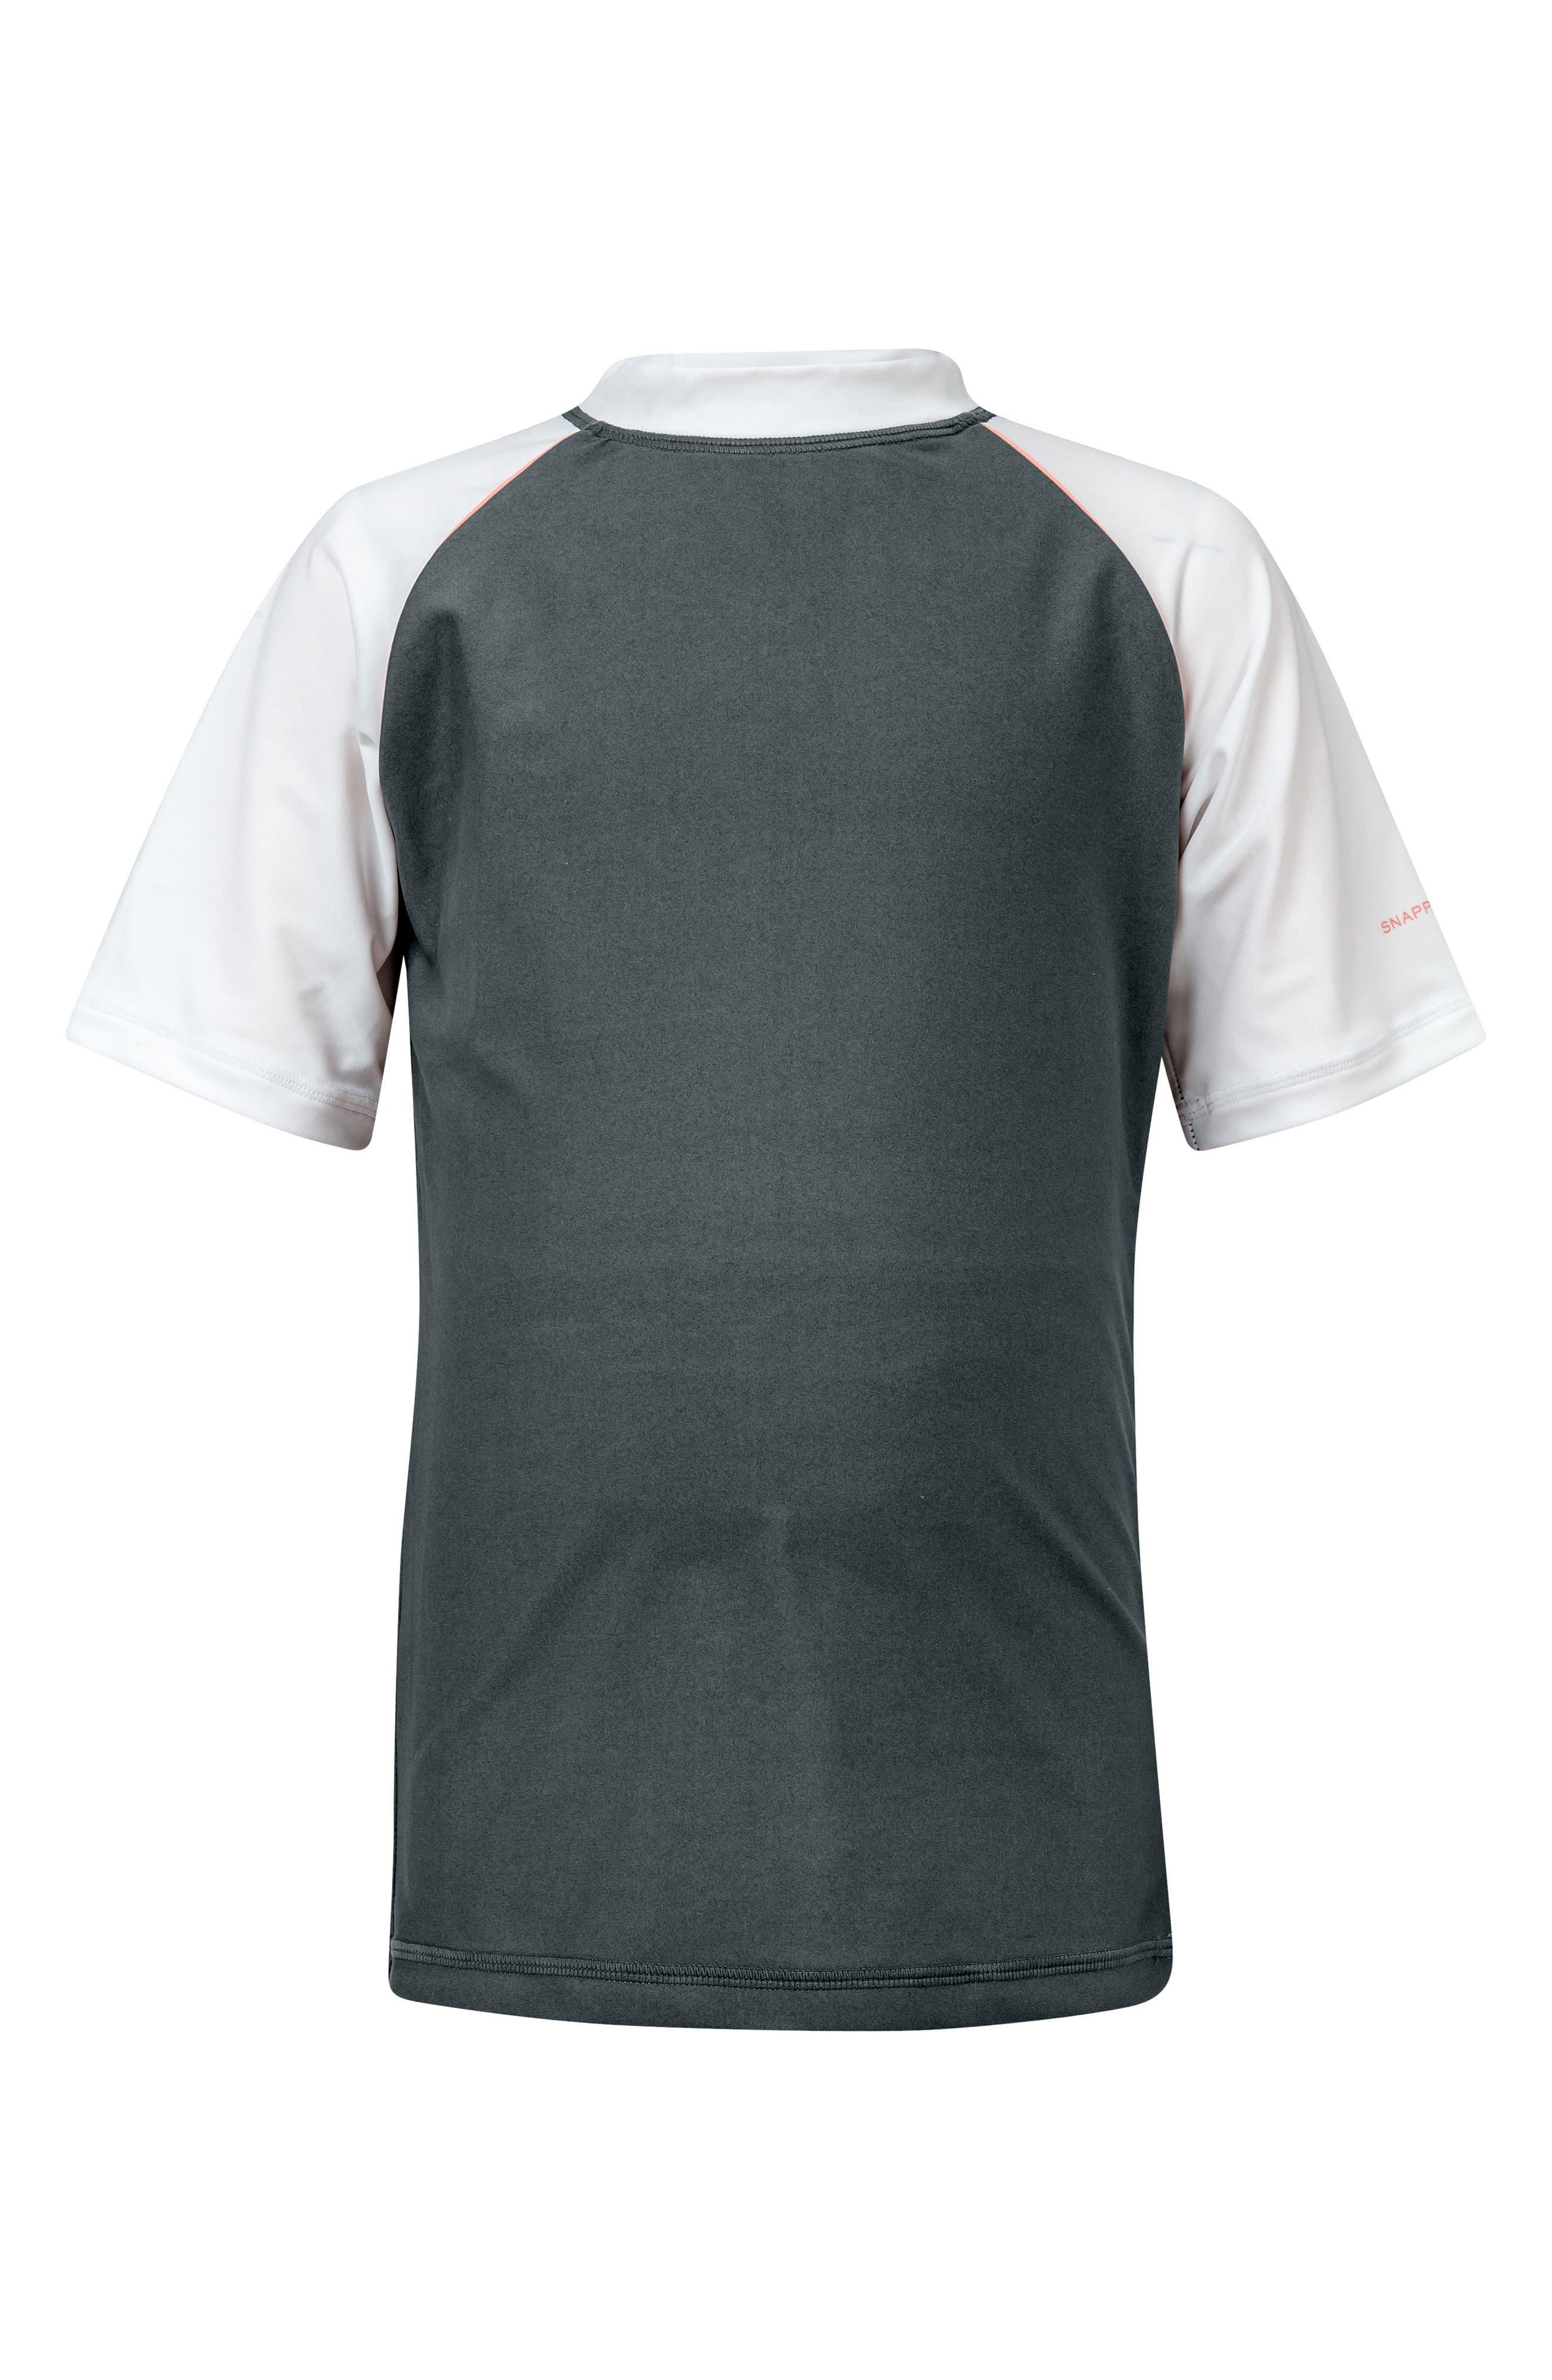 Raglan Short Sleeve Rashguard,                         Main,                         color, Steel Grey